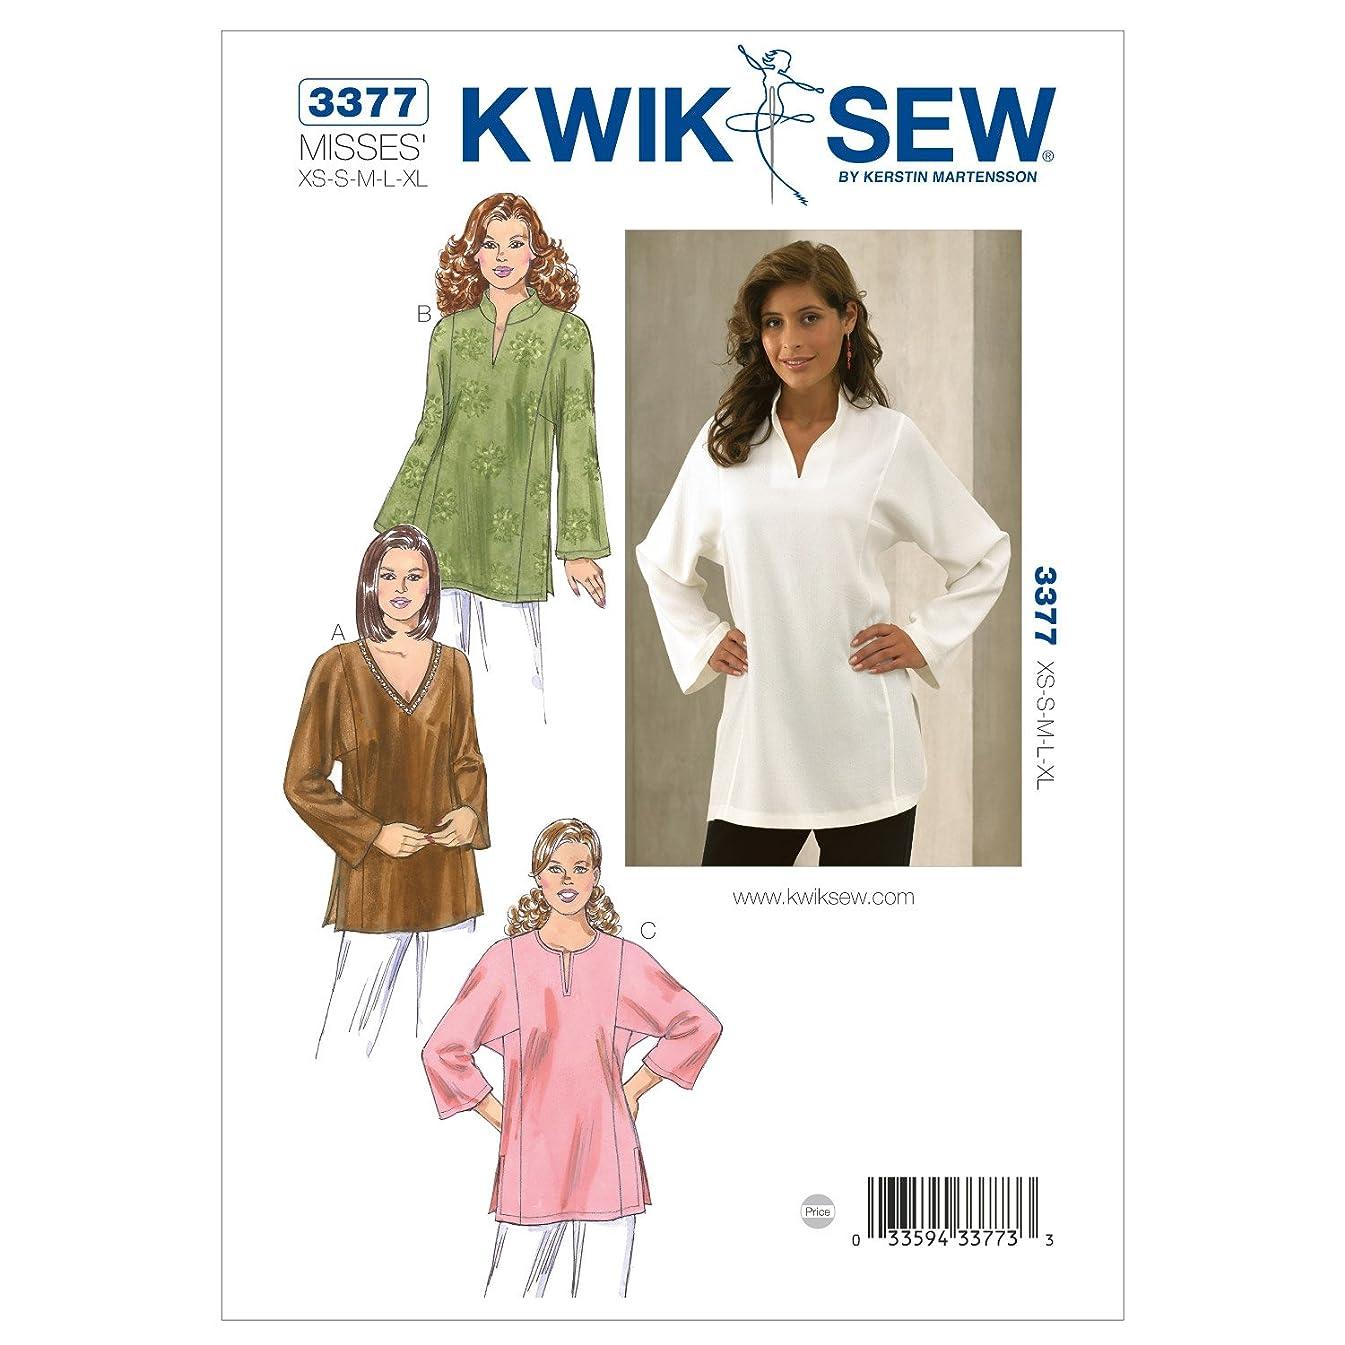 Kwik Sew K3377 Tunics Sewing Pattern, Size XS-S-M-L-XL